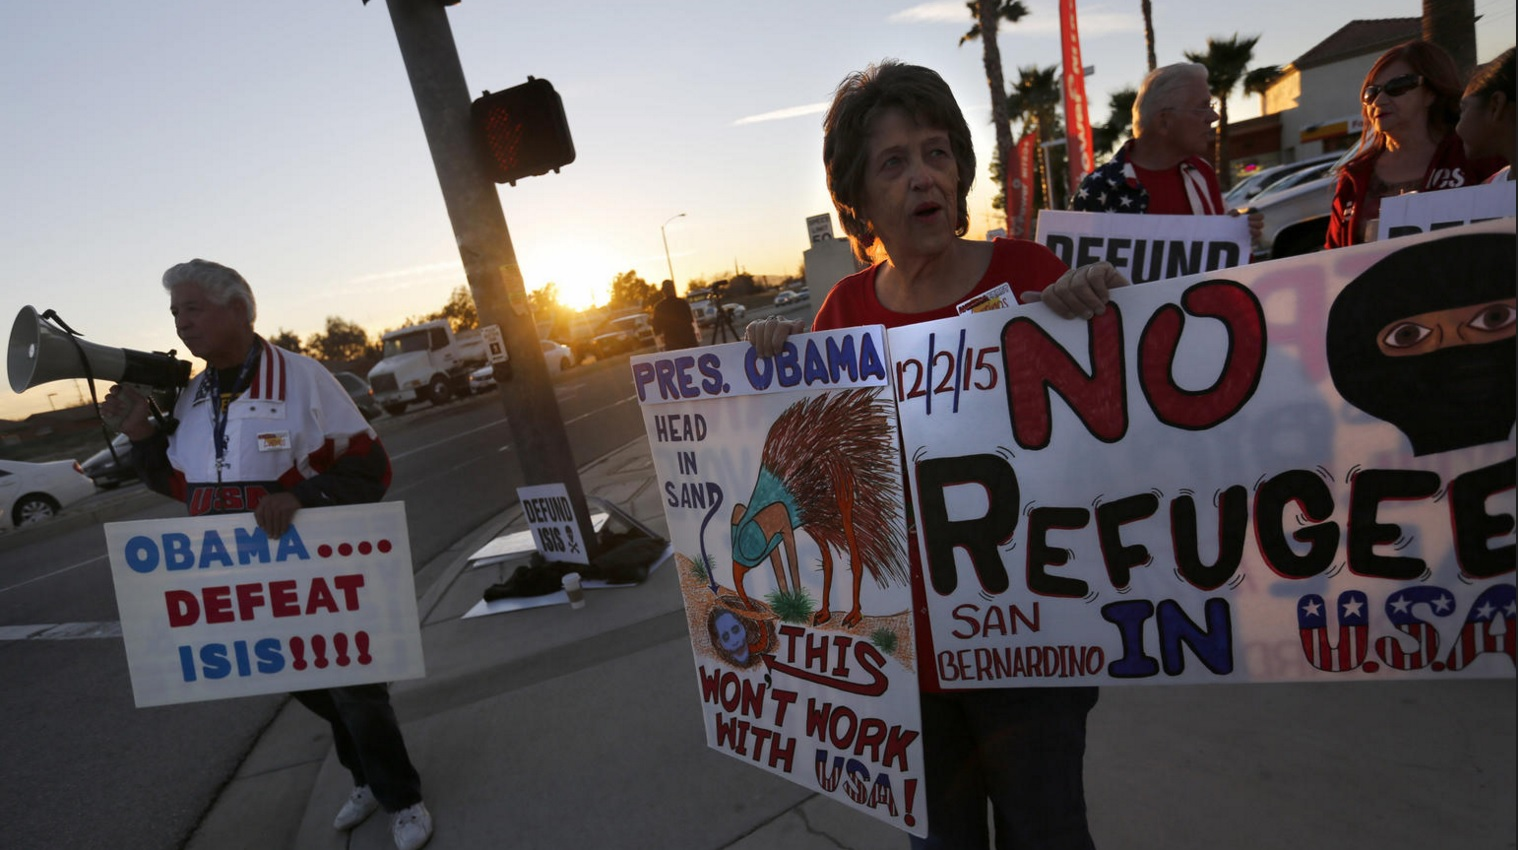 San Bernardino Shooter Reportedly Radicalized, Wife